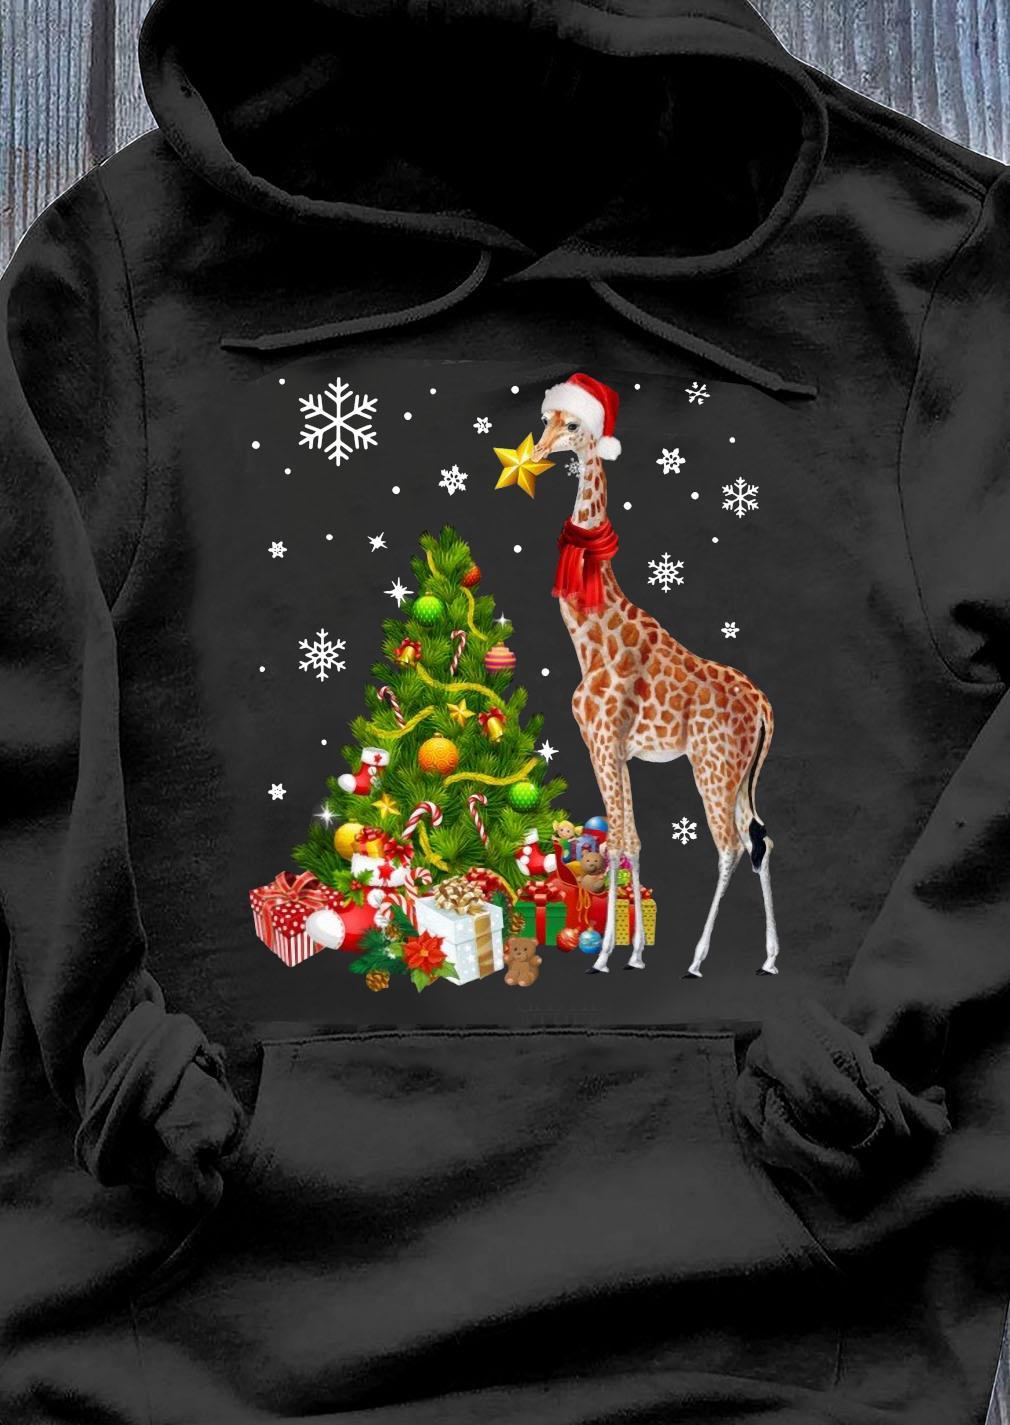 Giraffe Ornament Decoration Christmas Tree Crewneck Sweats Hoodie